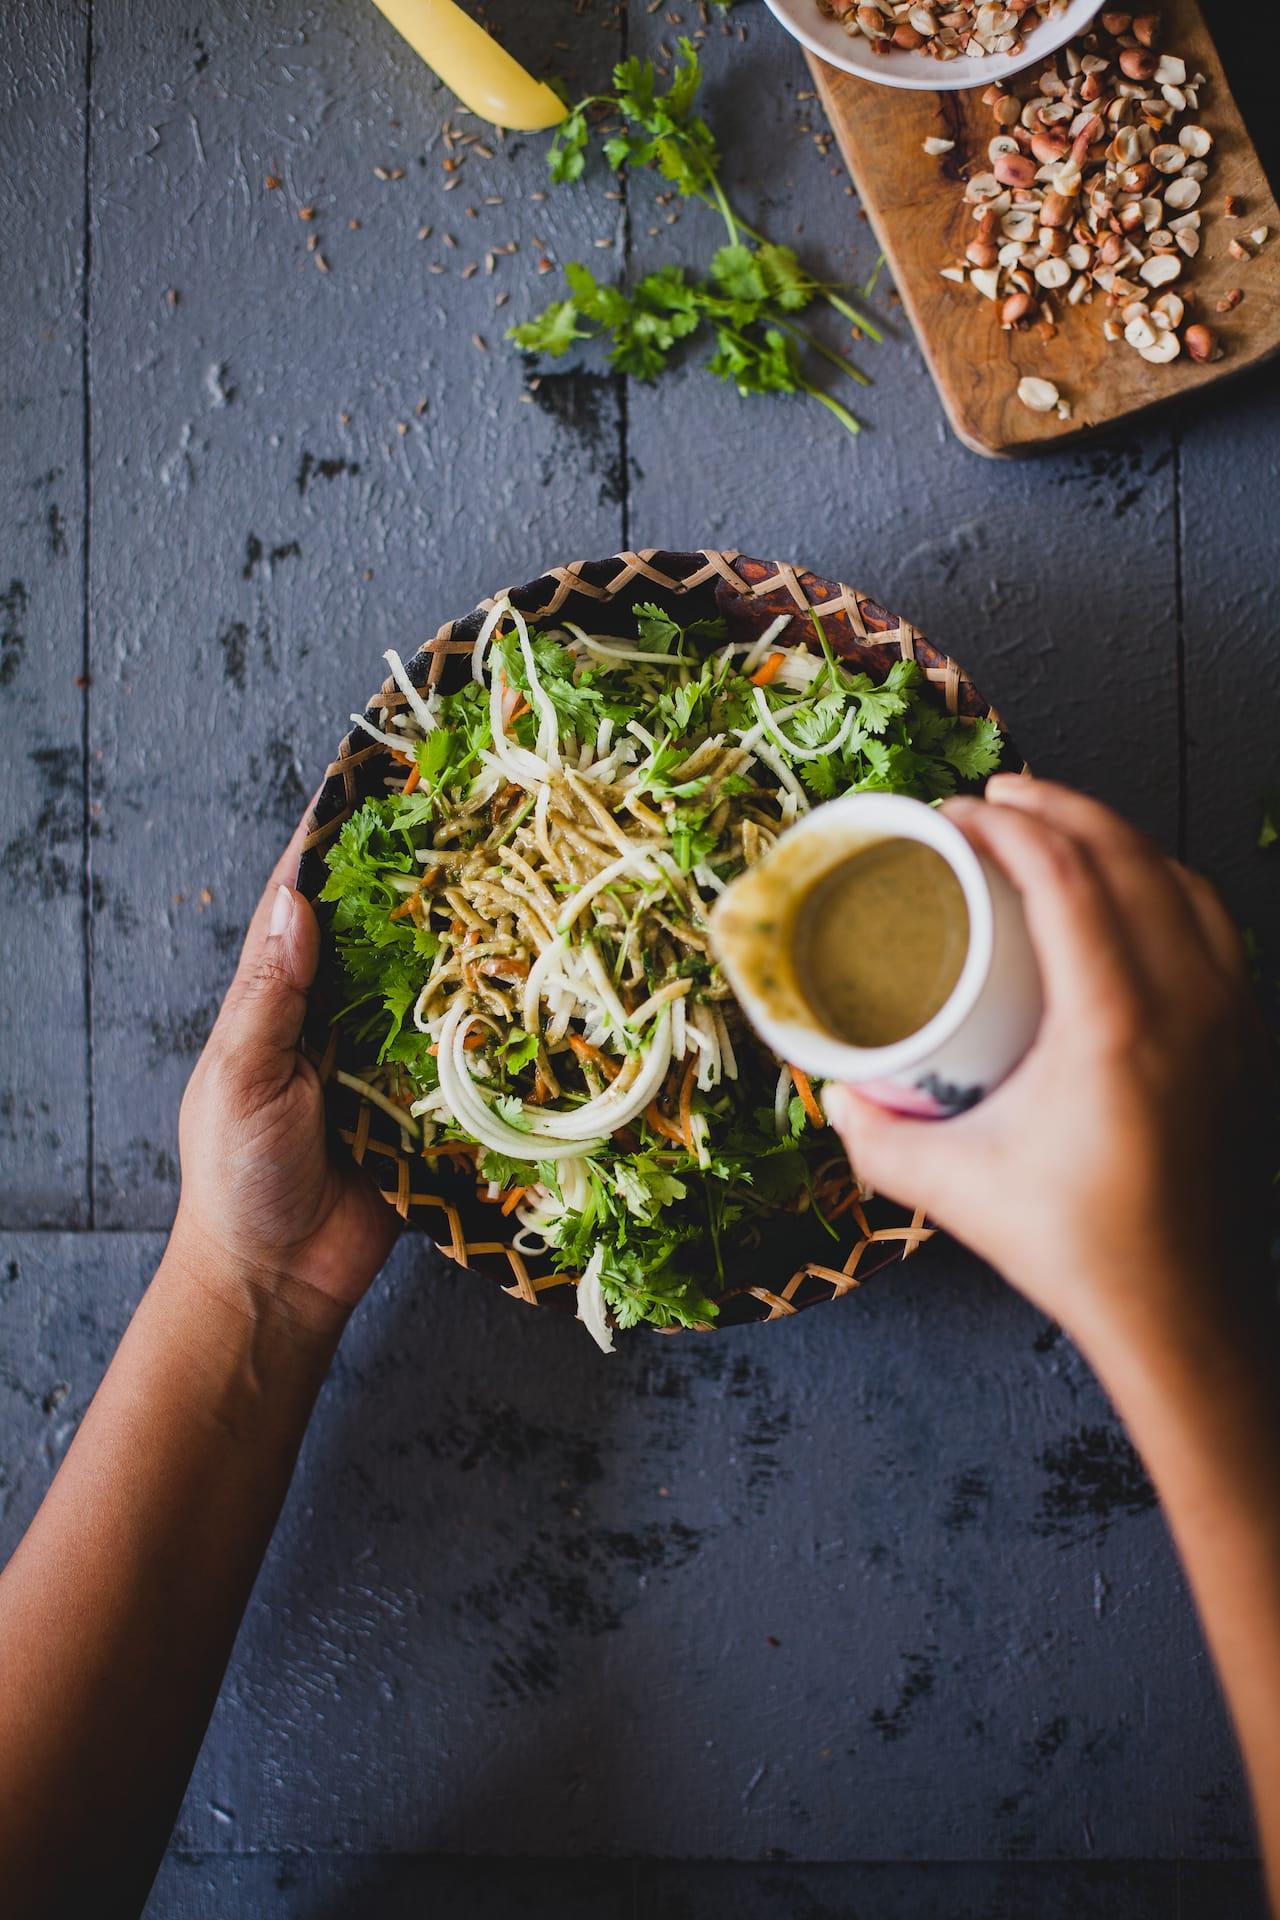 Spicy Mackerel Raw Papaya Salad| Playful Cooking